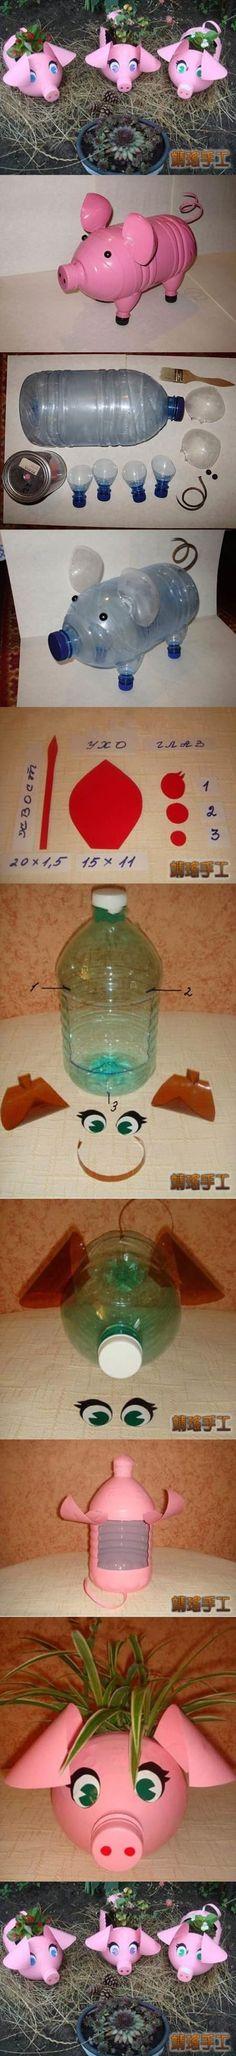 piglet planter made from plastic bottles M